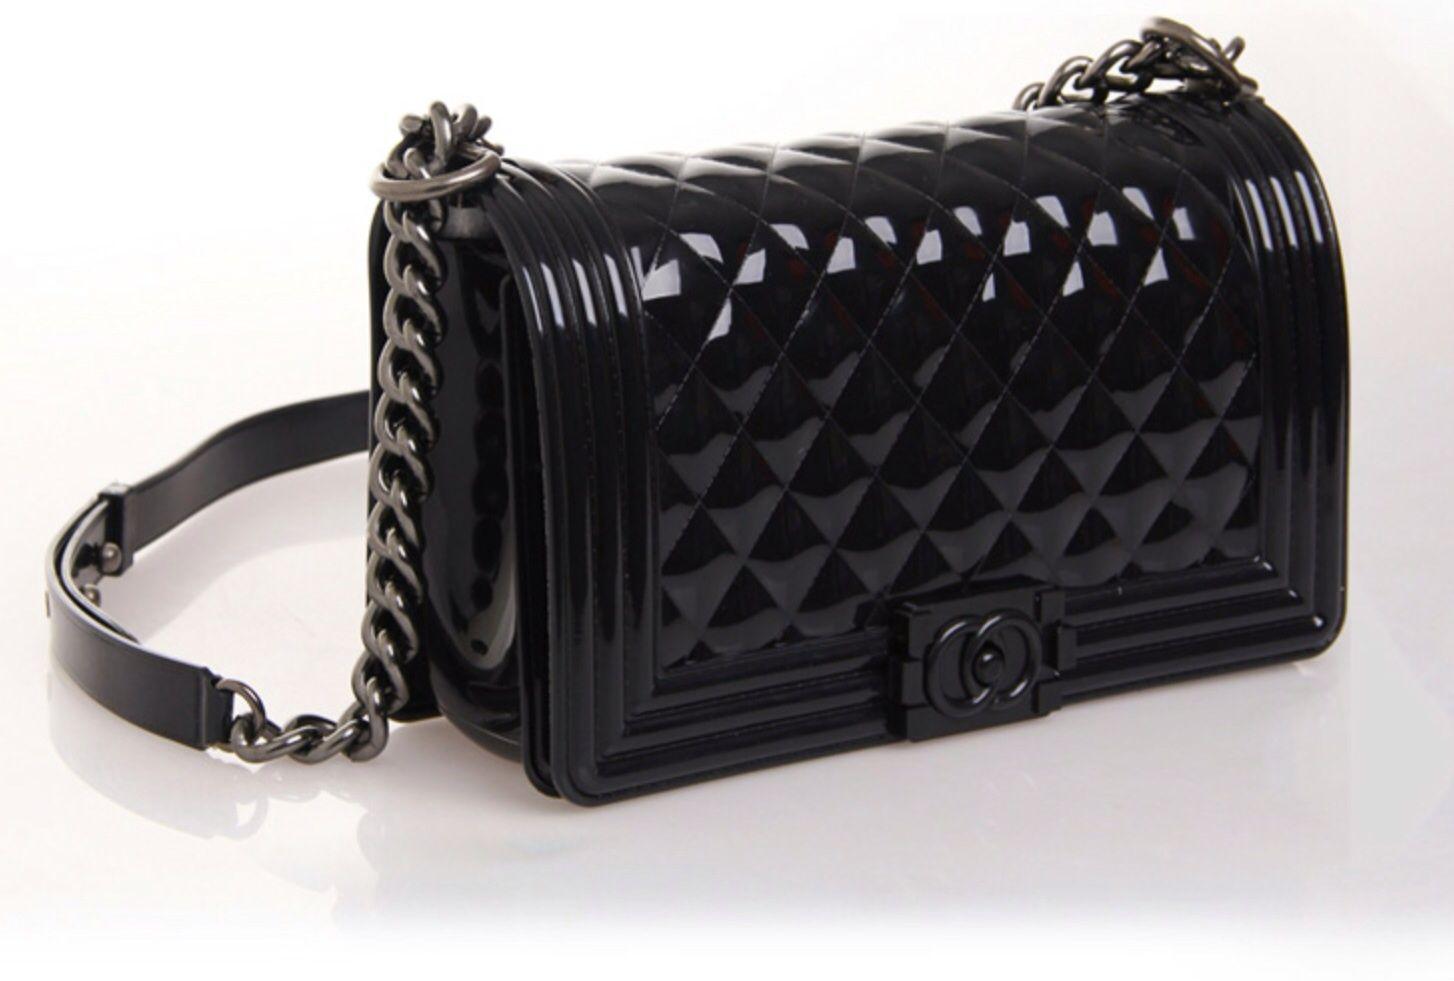 fd1887f5854250 Black Le Boy Jelly Bag | Le Boy Jelly Bag | Jelly bag, Bags, Chanel ...